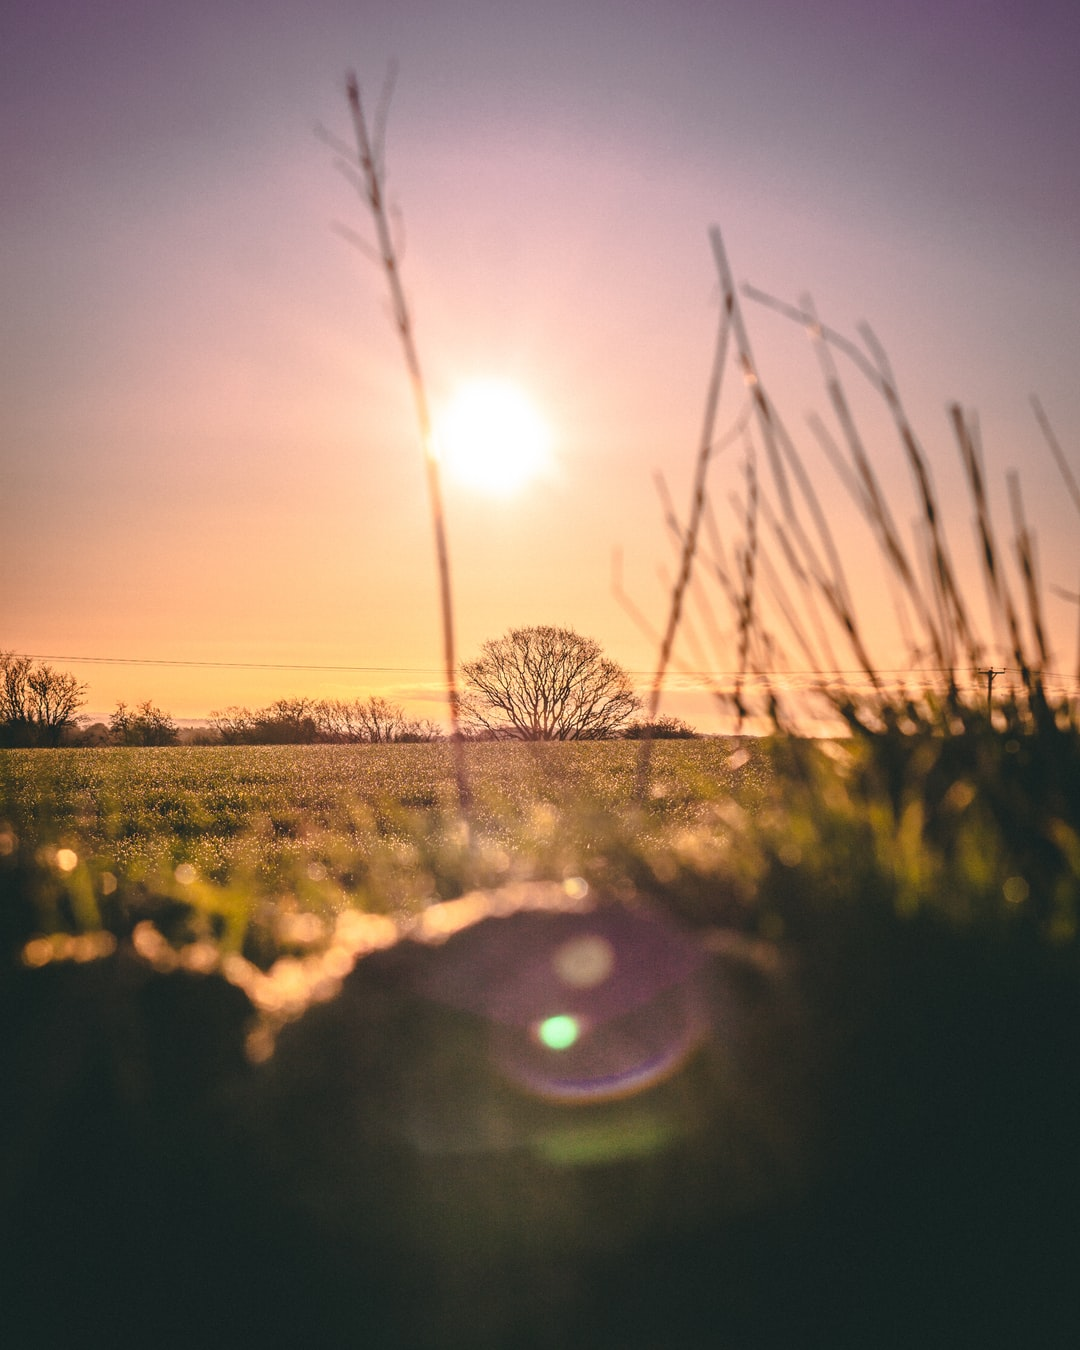 Morning sunrise in Yorkshire